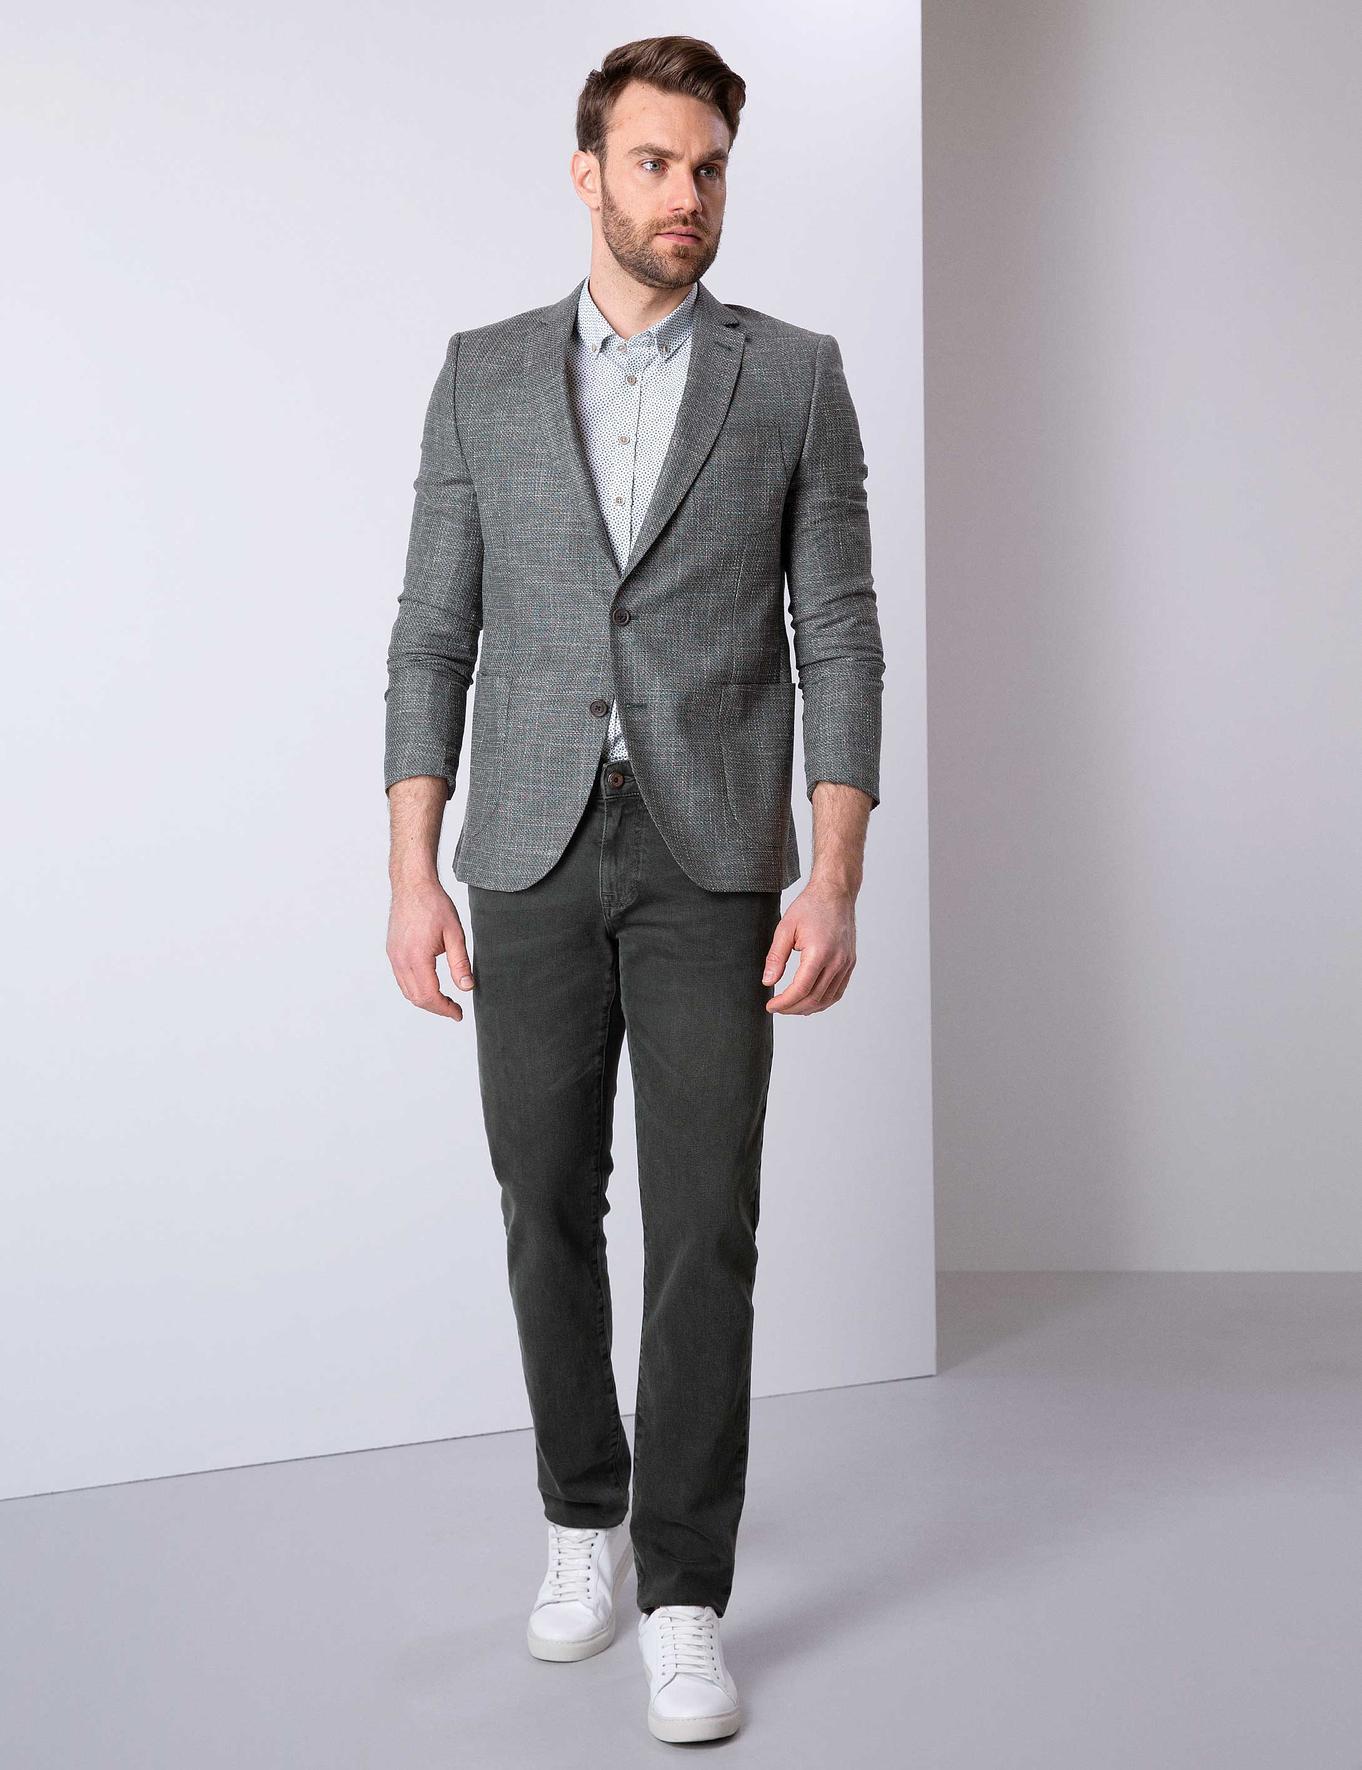 Koyu Yeşil Ekstra Slim Fit Ceket